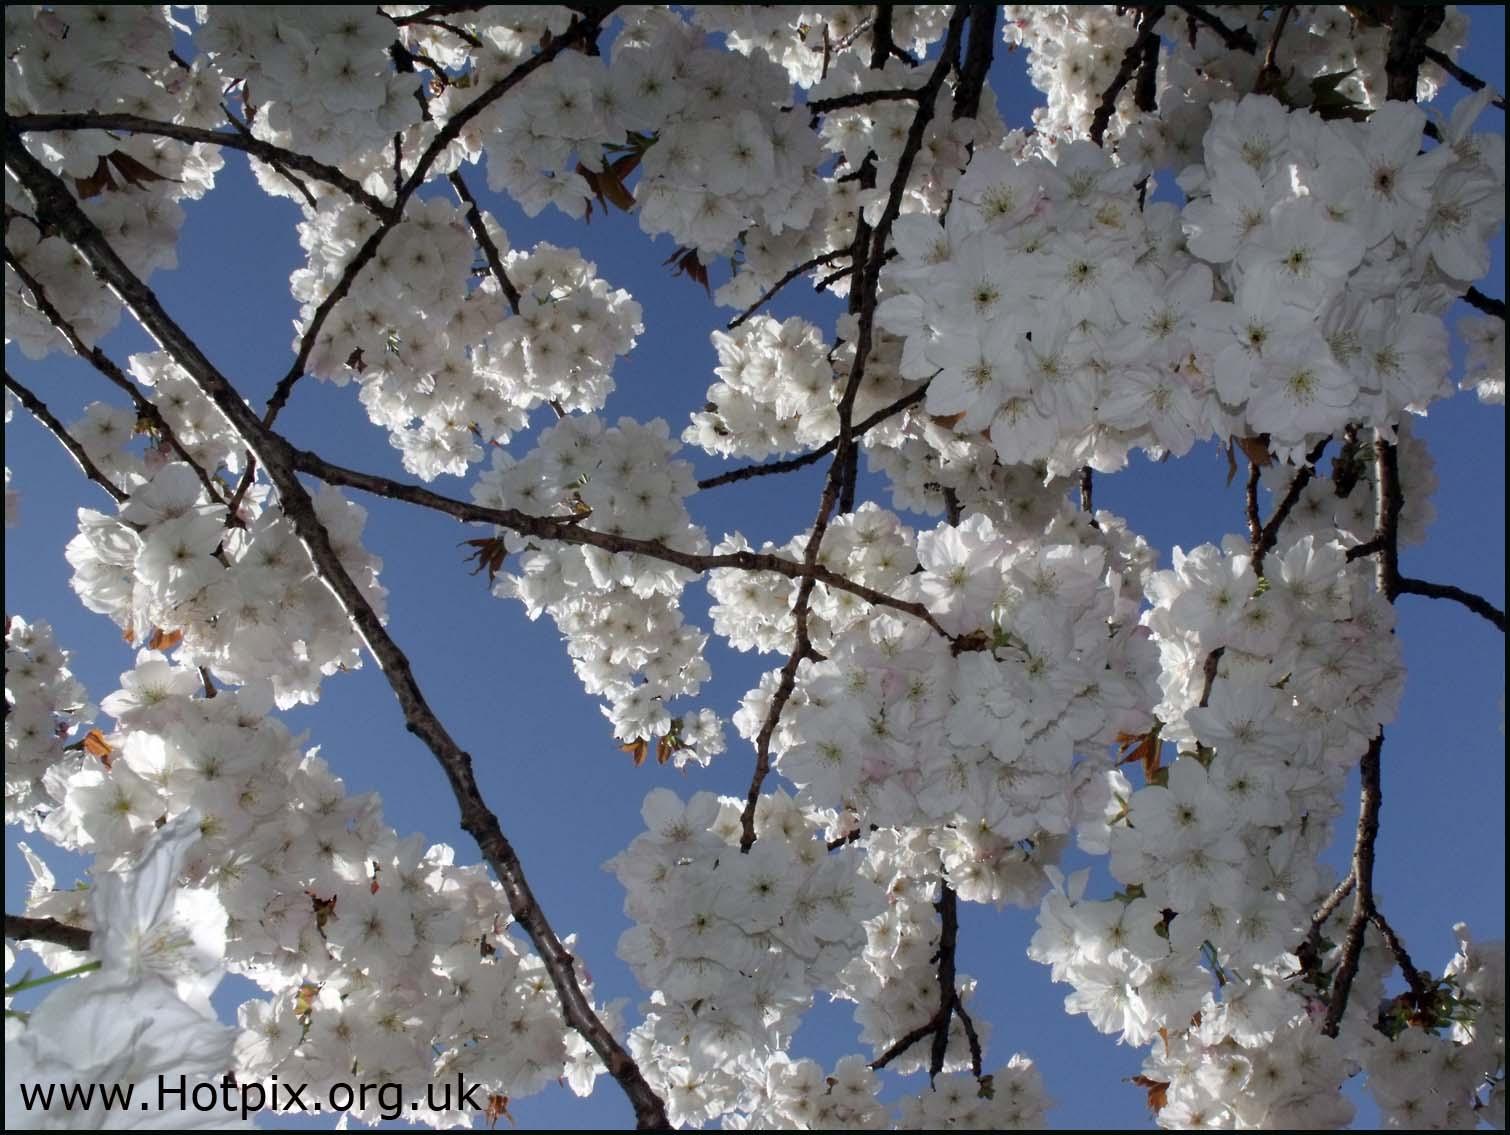 apple,tree,shrub,blossom,flower,sakura,white,blue,sky,poloriser,polariser,spring,bright,fresh,new,cheshire,rudheath,northwich,uk,united,kingdom,england,britain,nature,HDR,photomatix,hotpix!